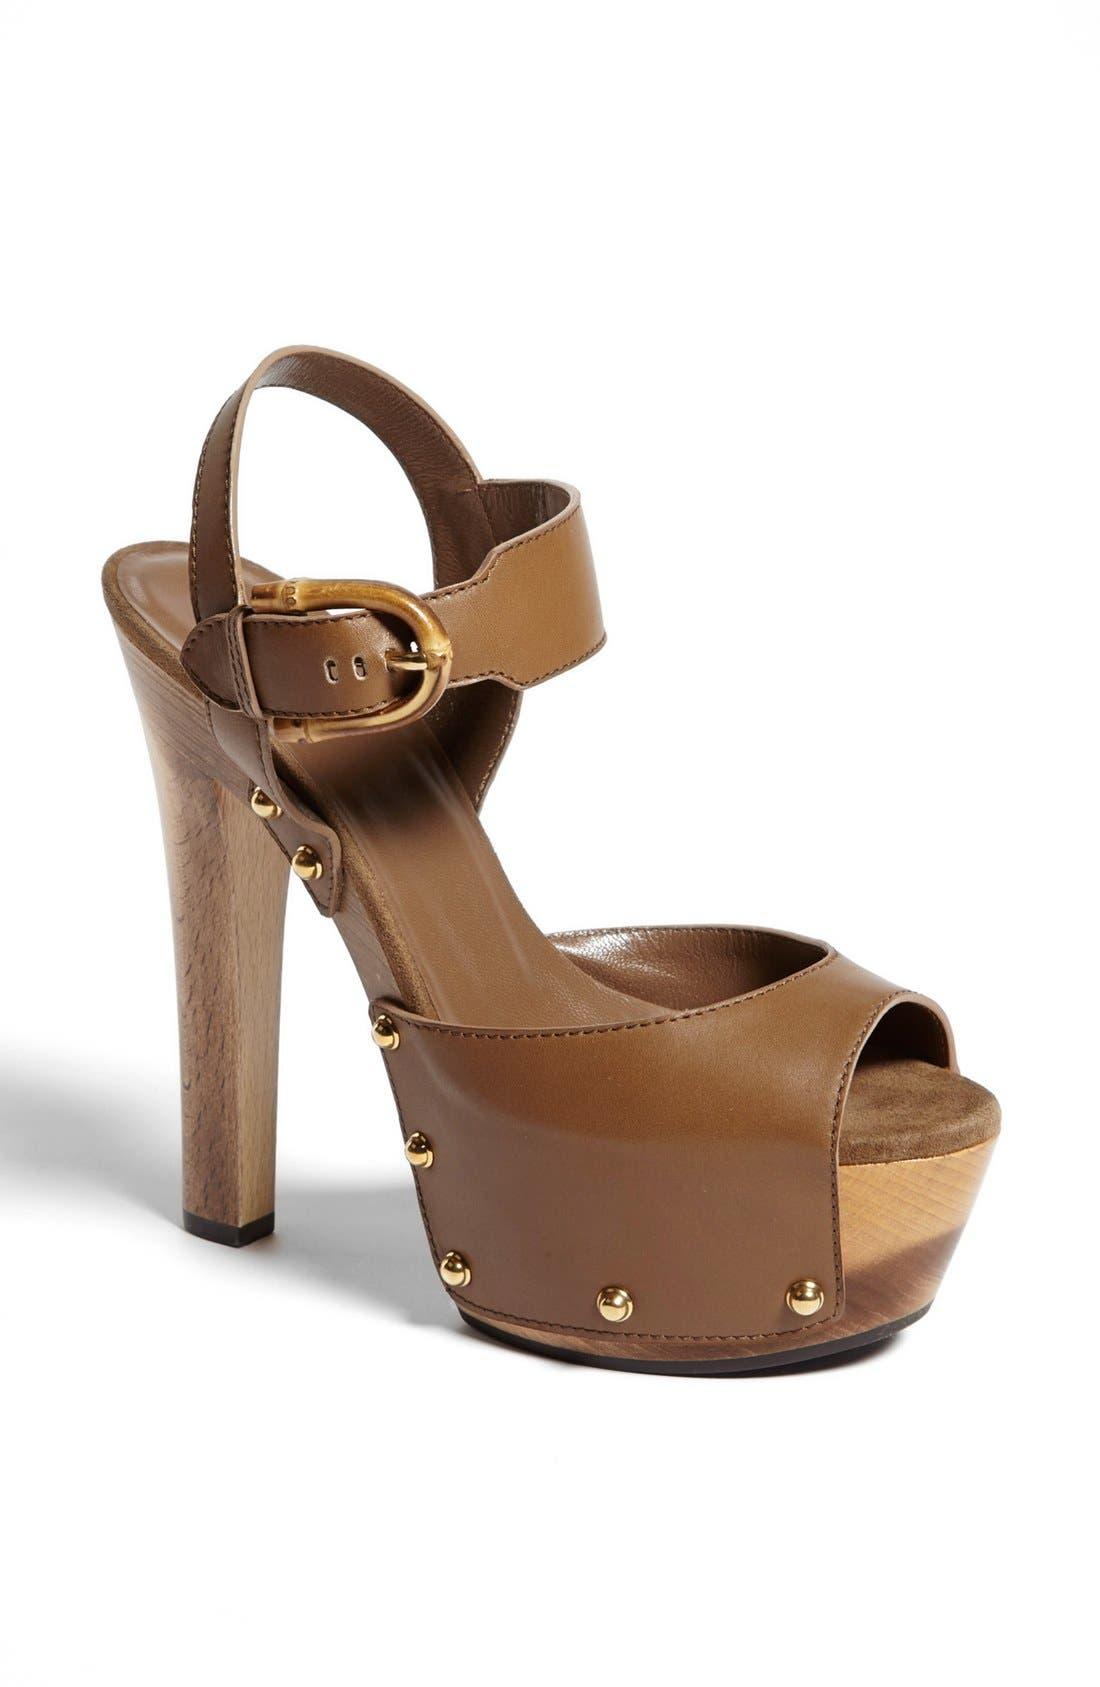 Main Image - Gucci 'Nadege' Clog Sandal